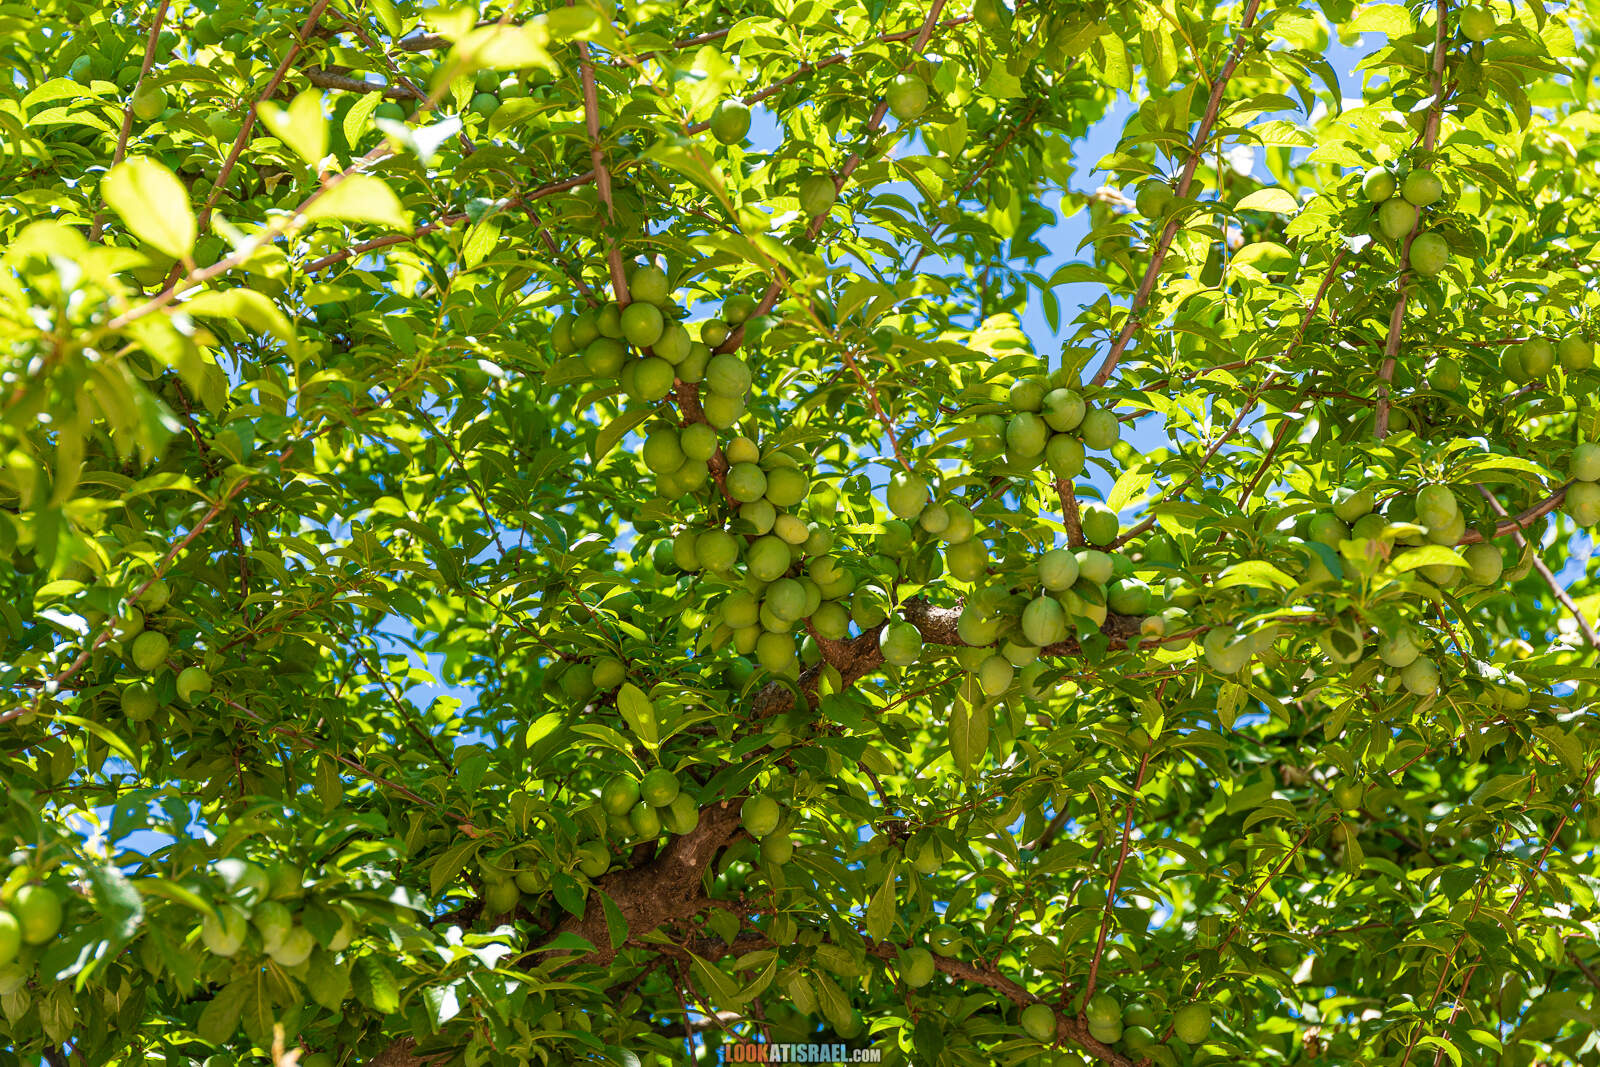 Тропа Голан - Тропа Черешни - от поселка Нимрод до мемориала Пальсар 7 - Буката, Масаде, гора Одем, гора Хермонит и гора Хермон и Голанские высоты |  LookAtIsrael.com - Фото путешествия по Израилю